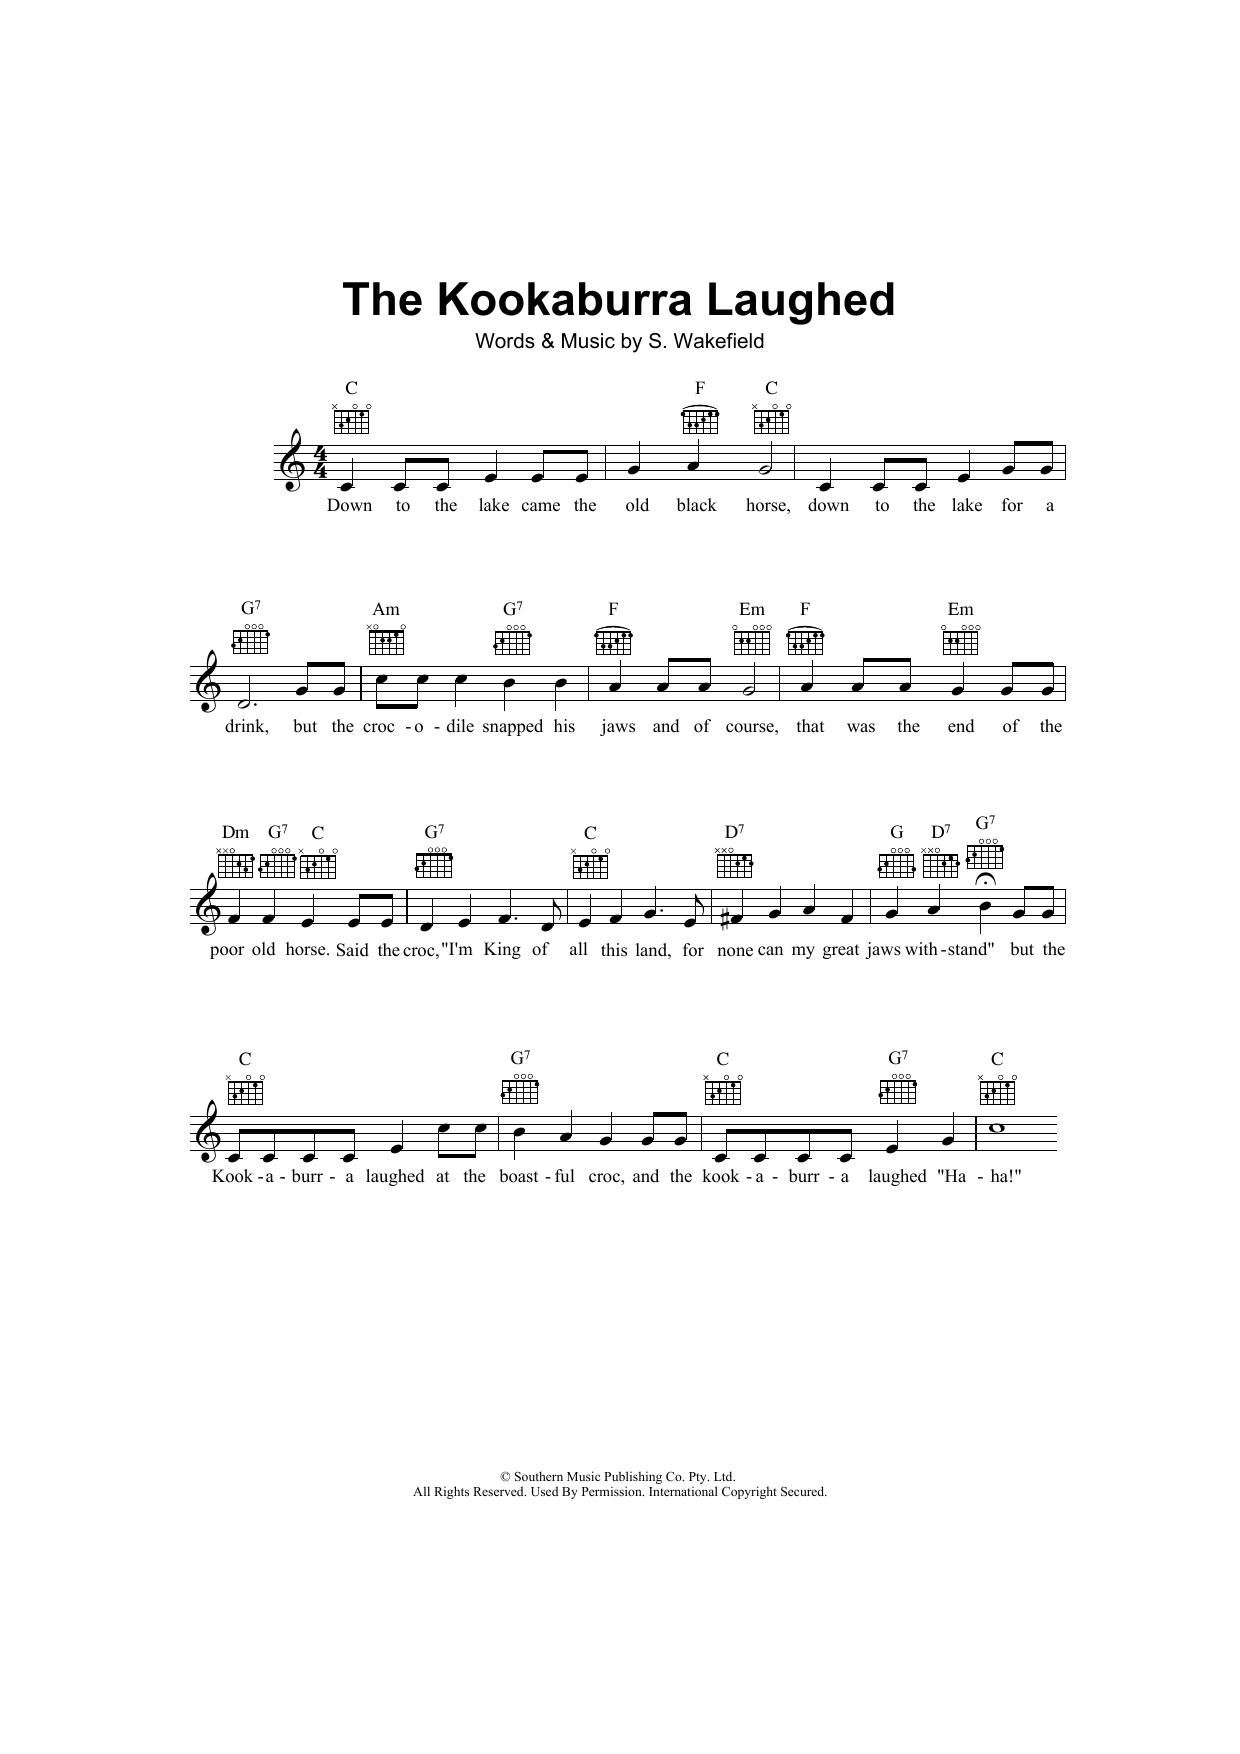 The Kookaburra Laughed Sheet Music